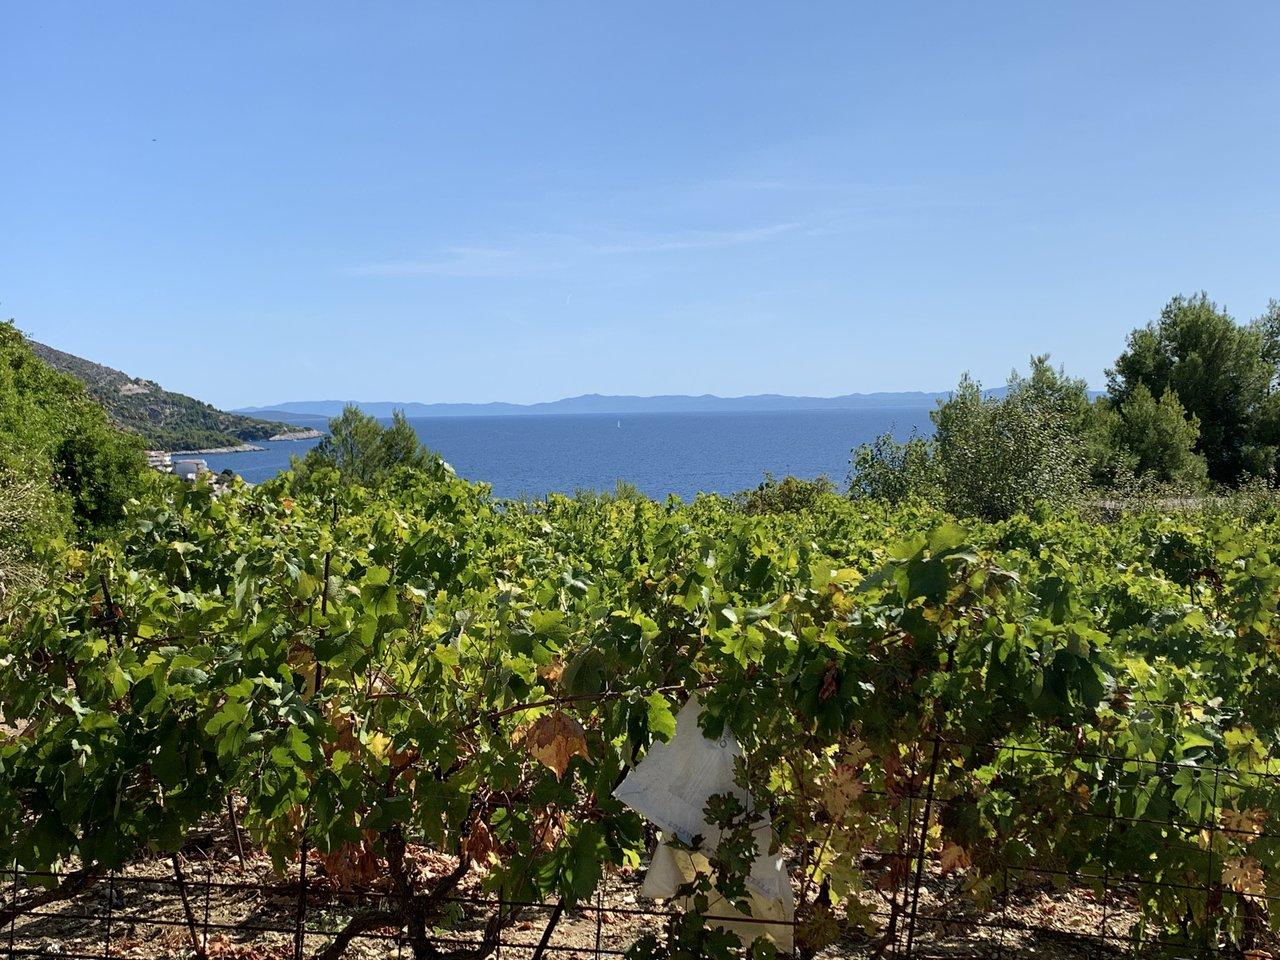 Vineyards along the Hvar coast | Photo taken by Eva W